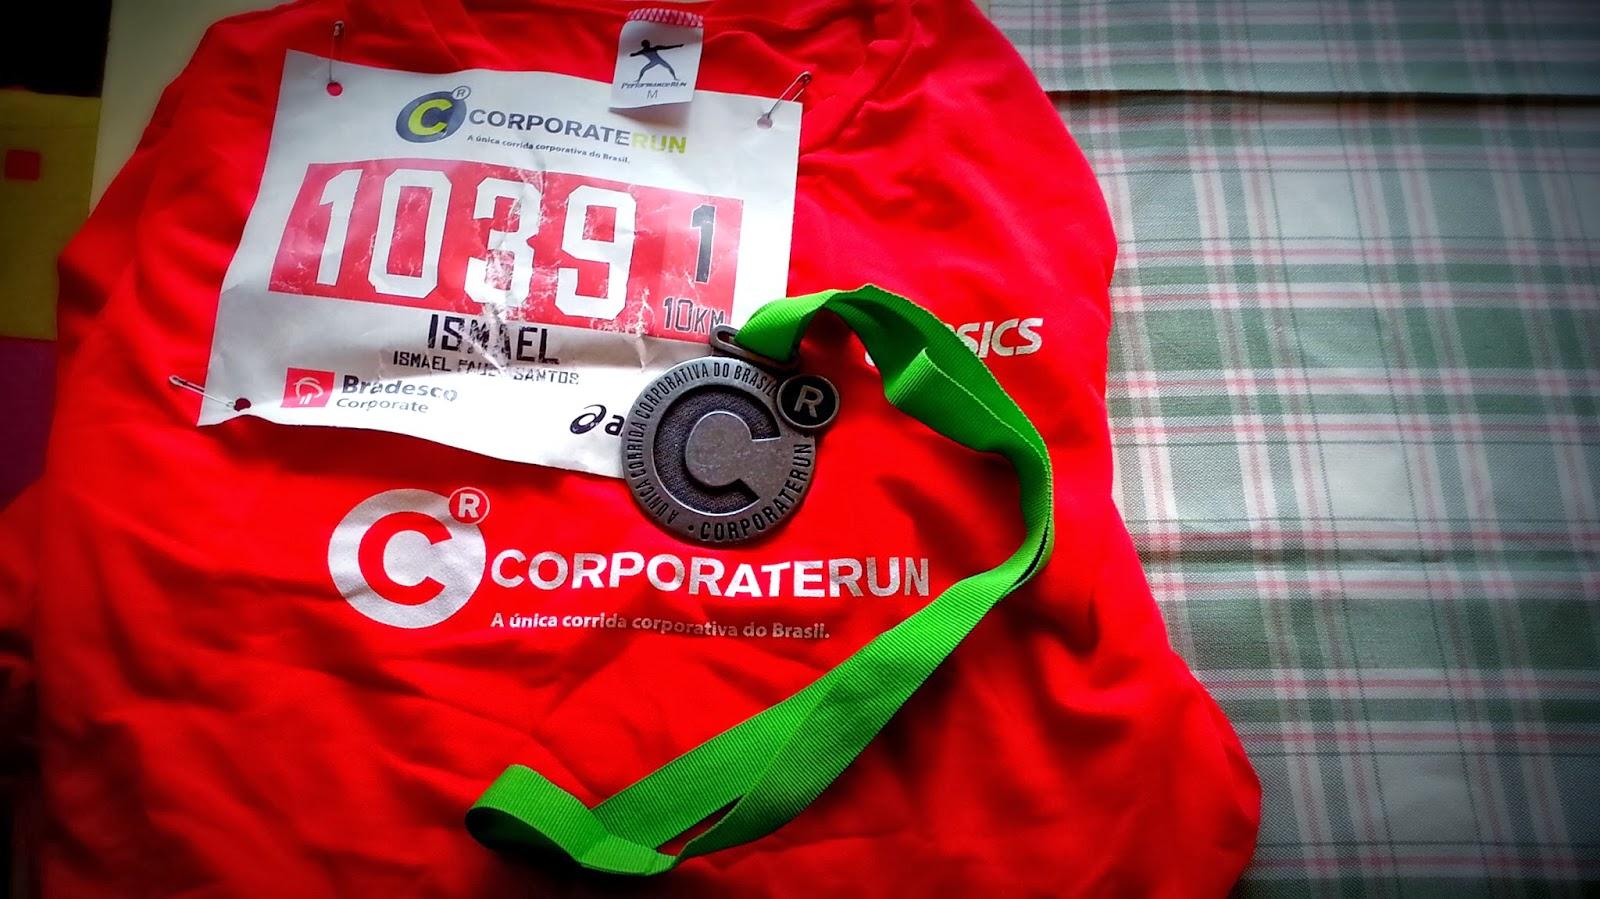 Corporate Run 10k 2013 - Camiseta, número de peito e medalha da prova